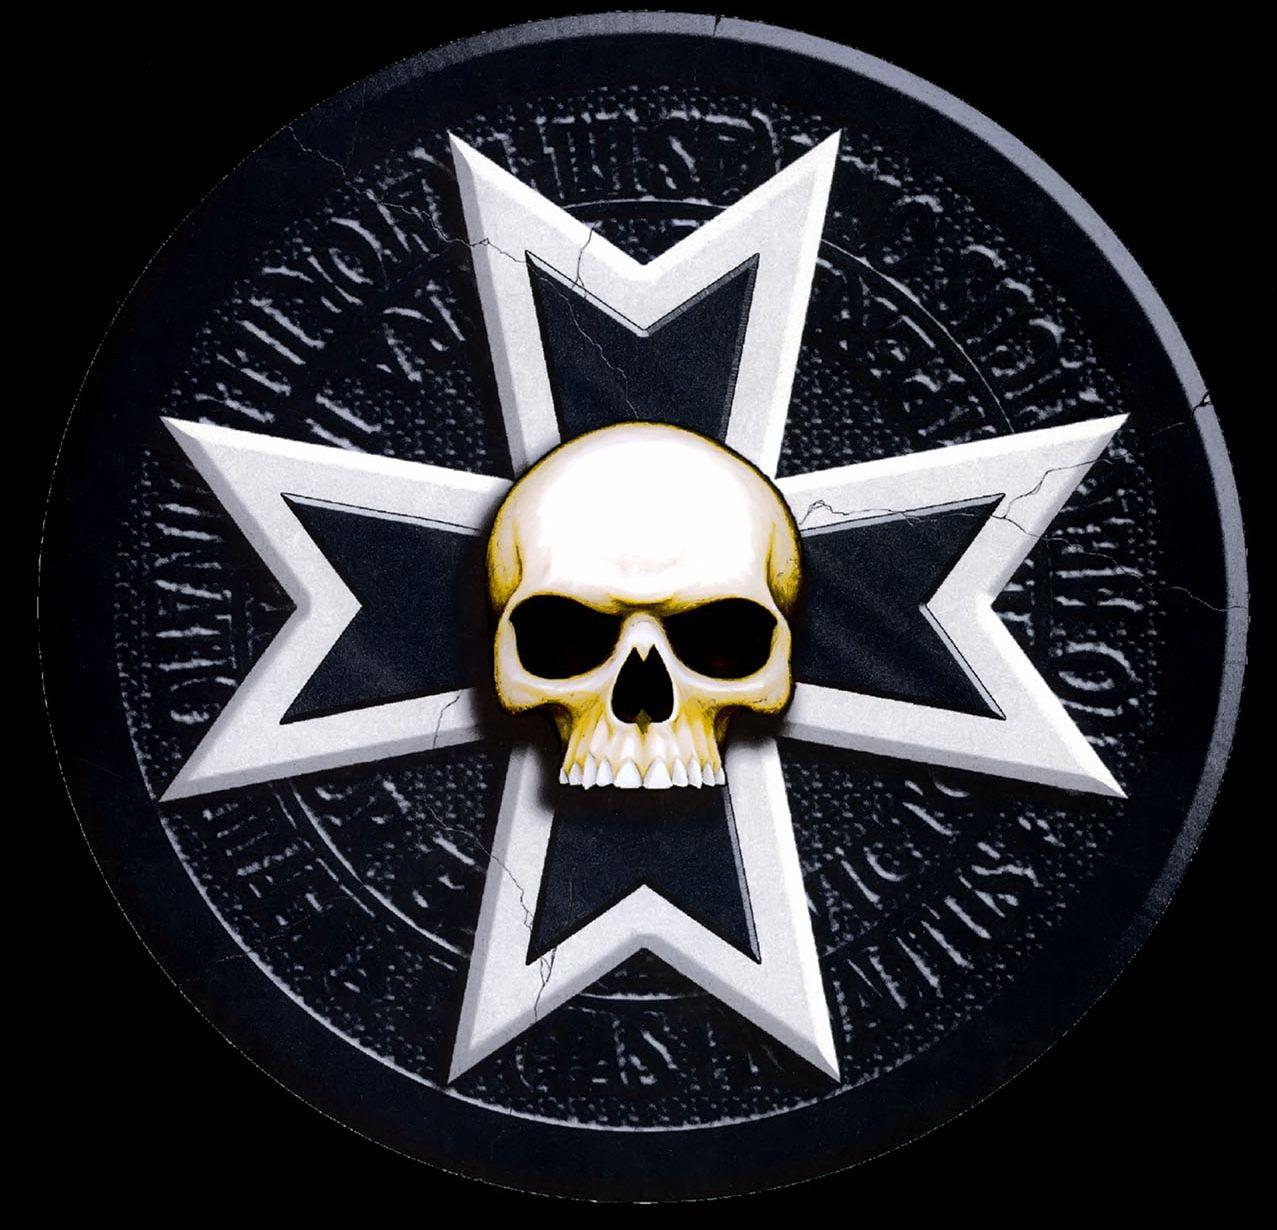 Black Templars Warhammer 40k Wiki Fandom